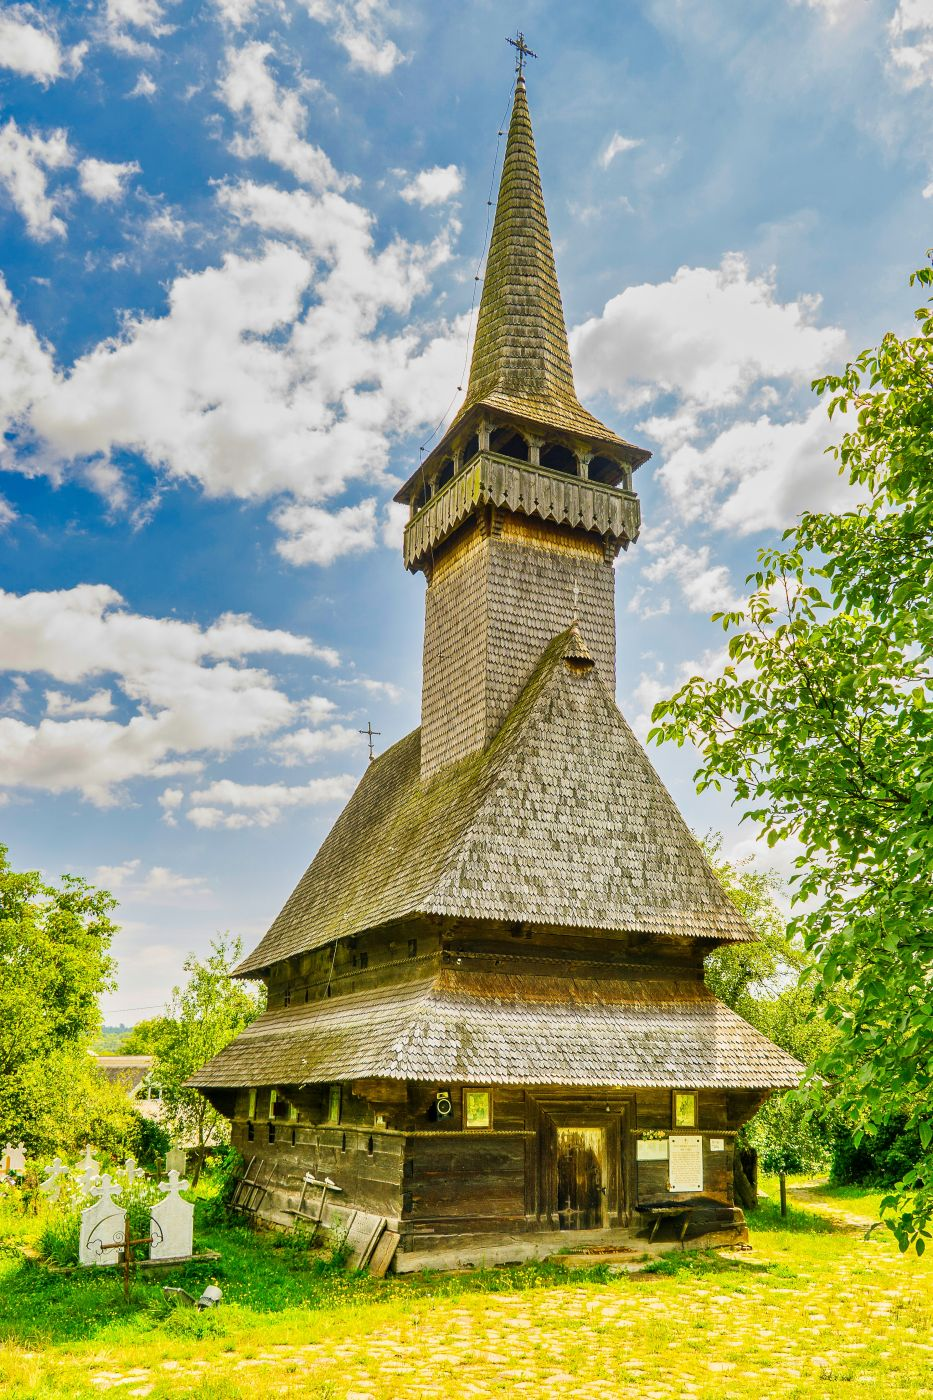 wooden church of Sat-Sugatag, Romania